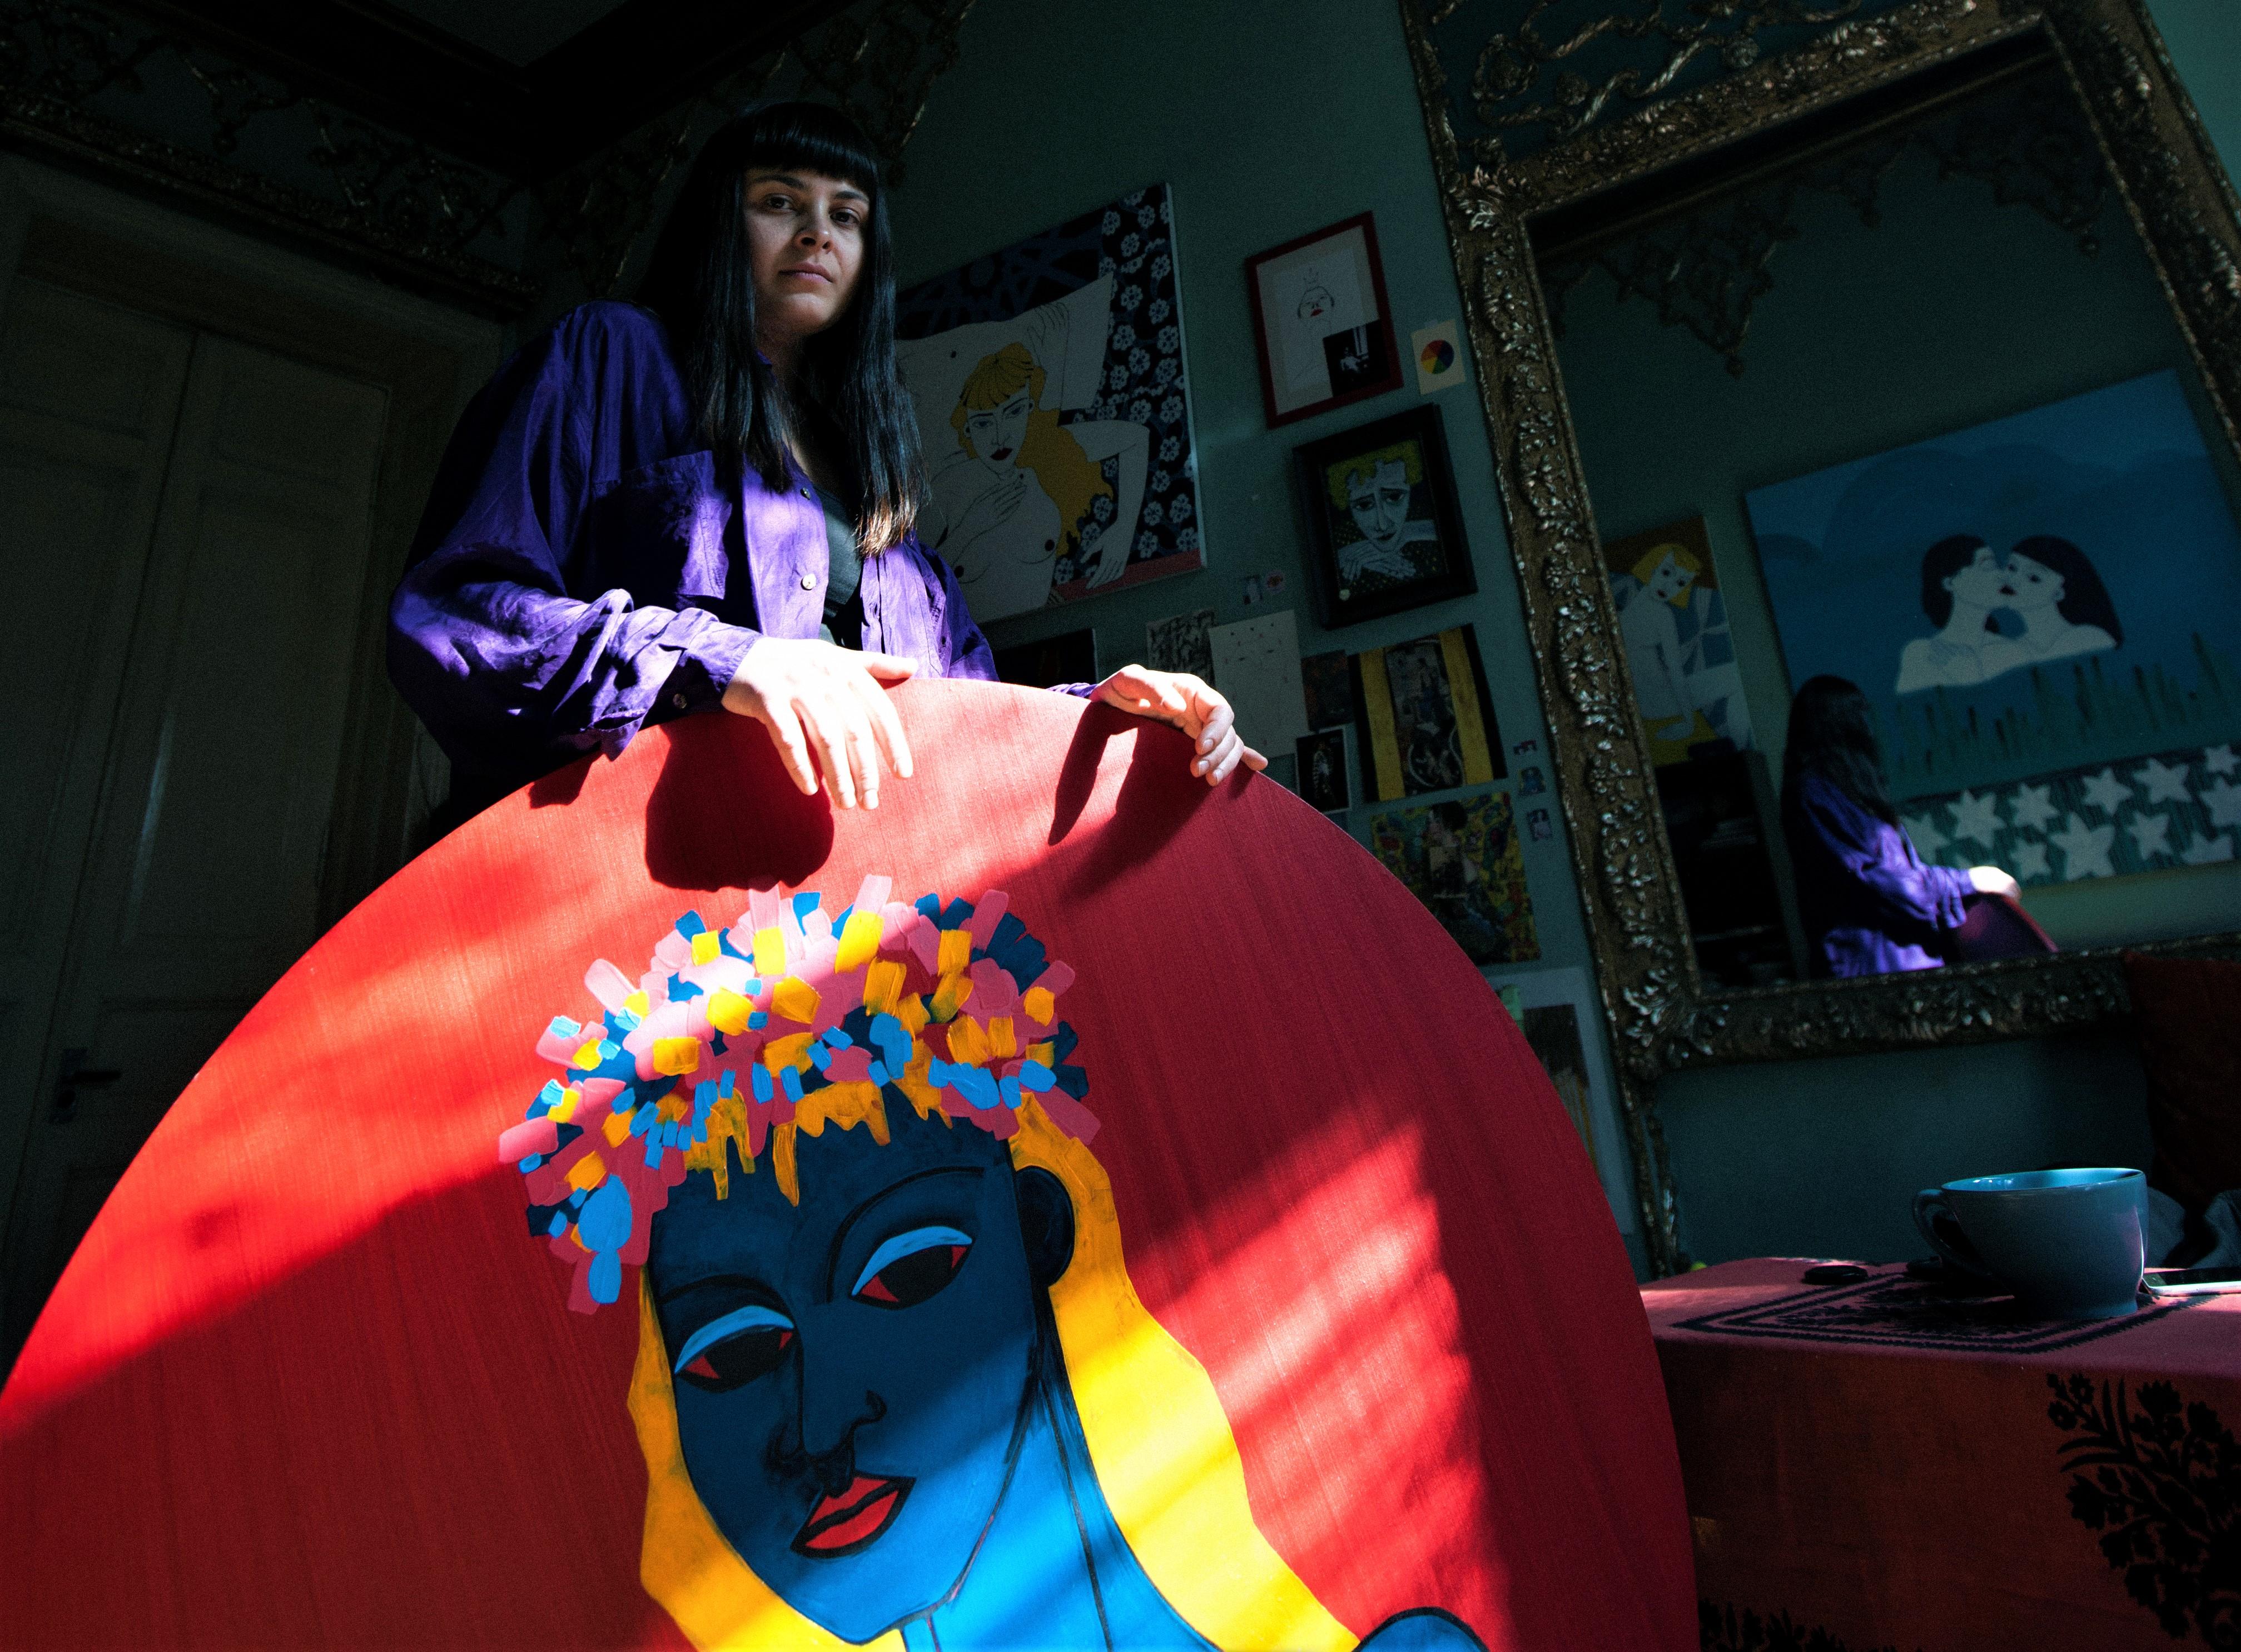 Salome Bauer #art featured, арт, выставка, Грузия, искусство, перформанс, Саломея Бауэр, художница